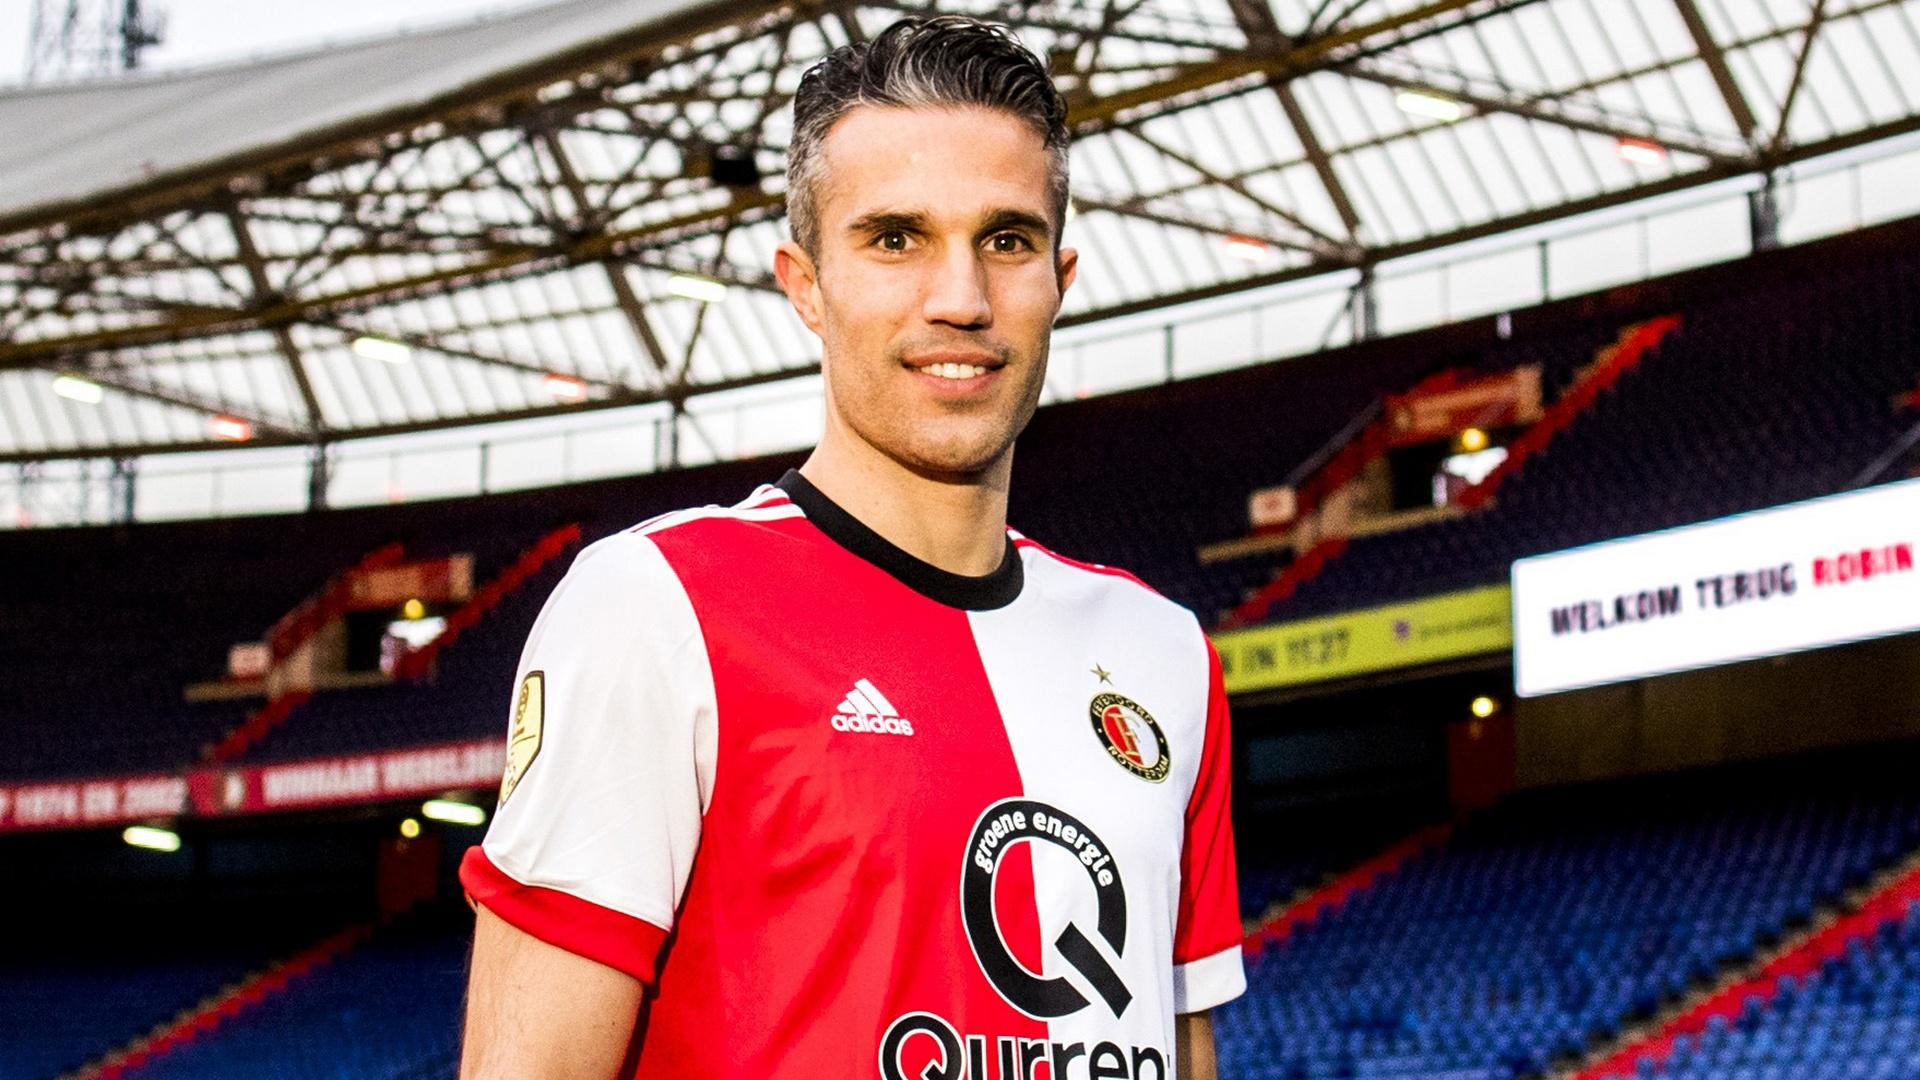 Kompany tried to get me to join Anderlecht - Van Persie